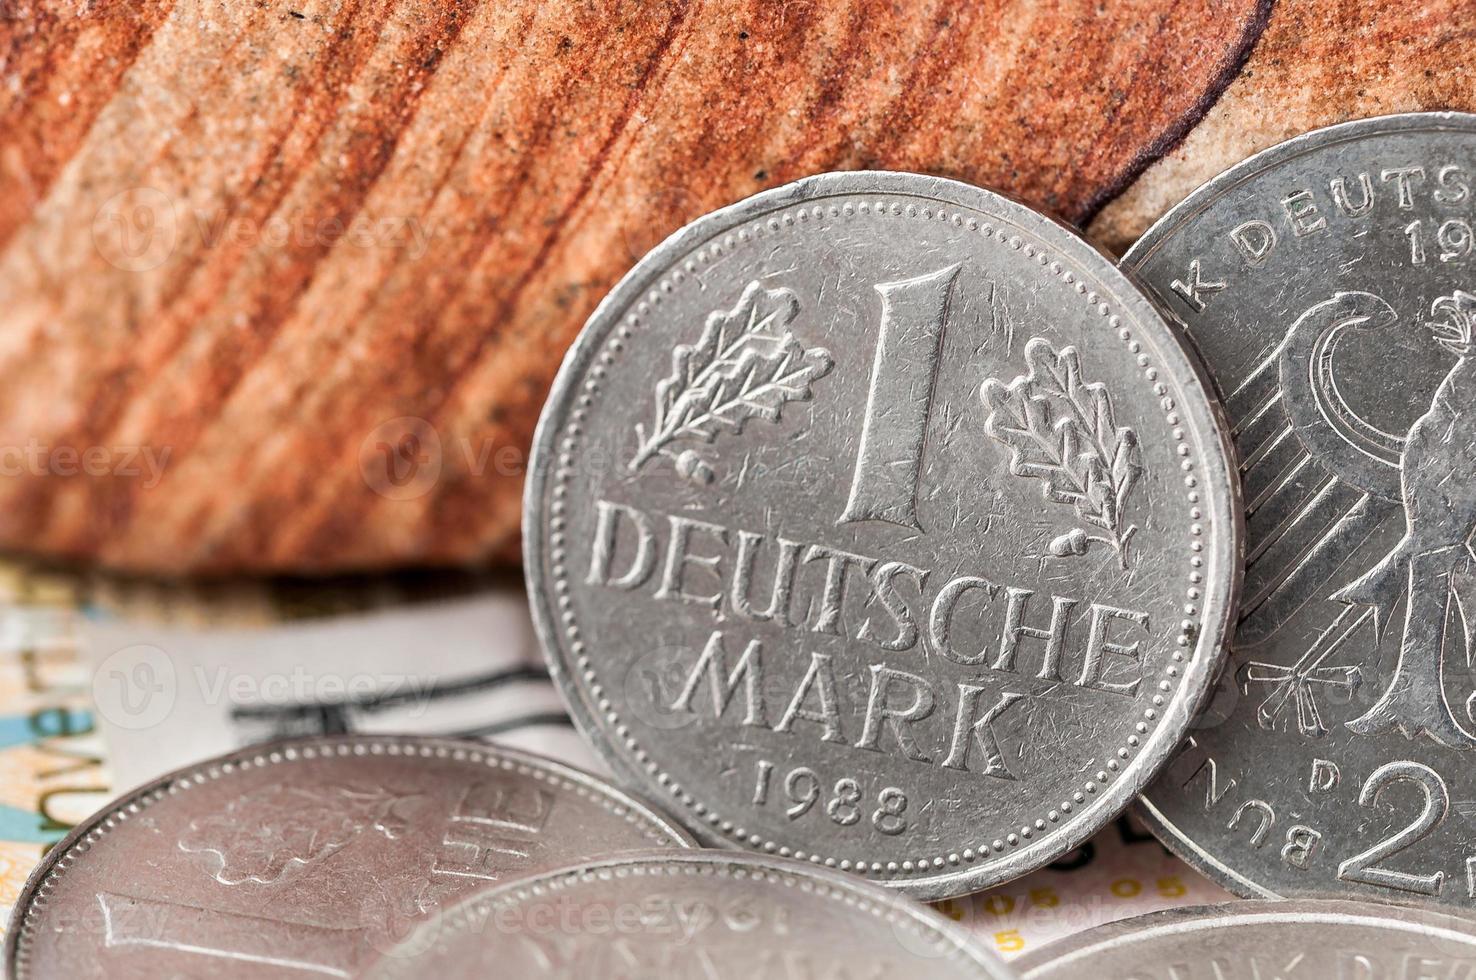 5 Duitse mark bundesrepubik deutschland foto